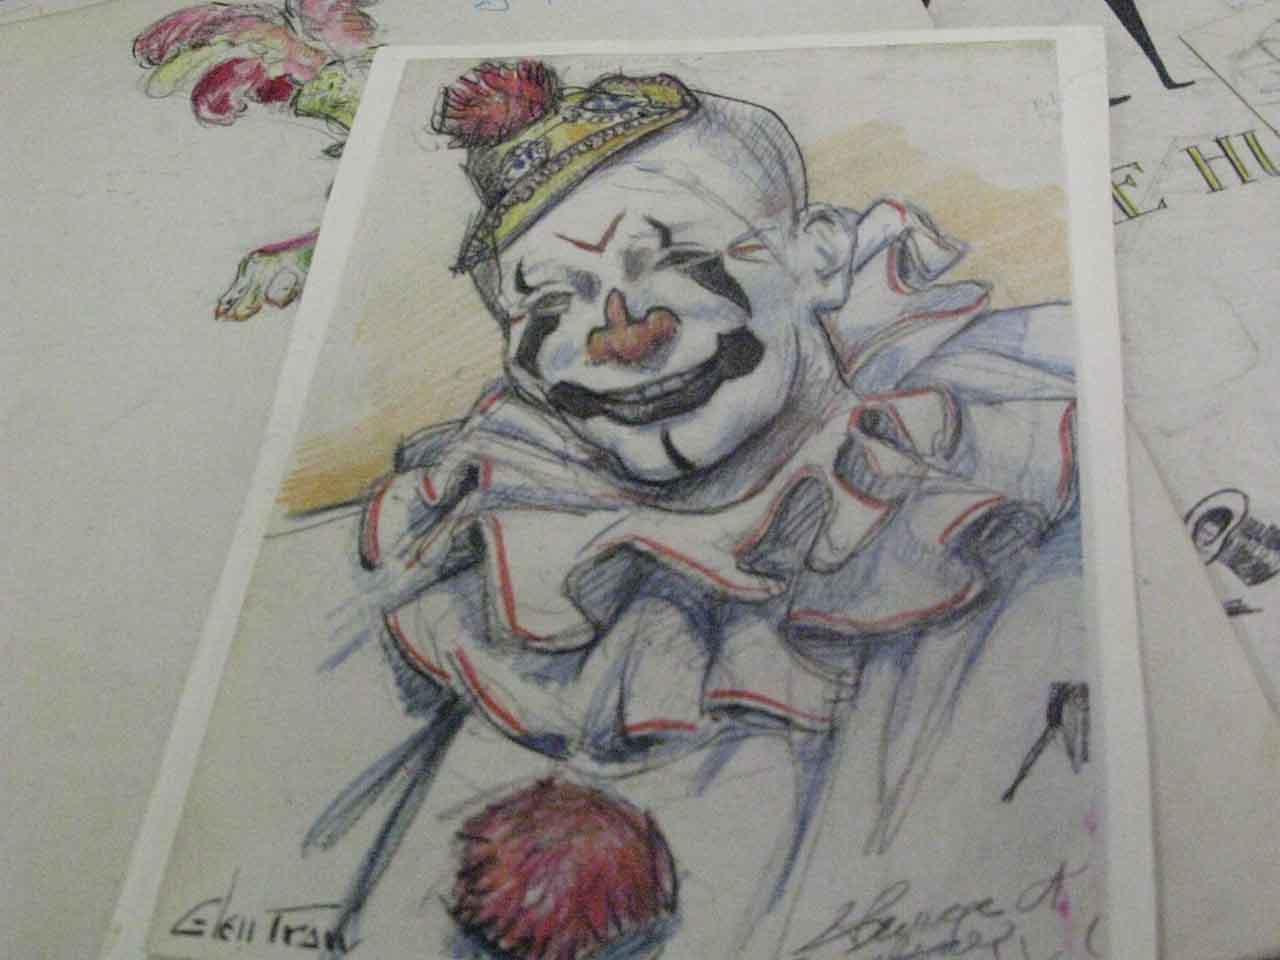 Sketch of a clown in makeup